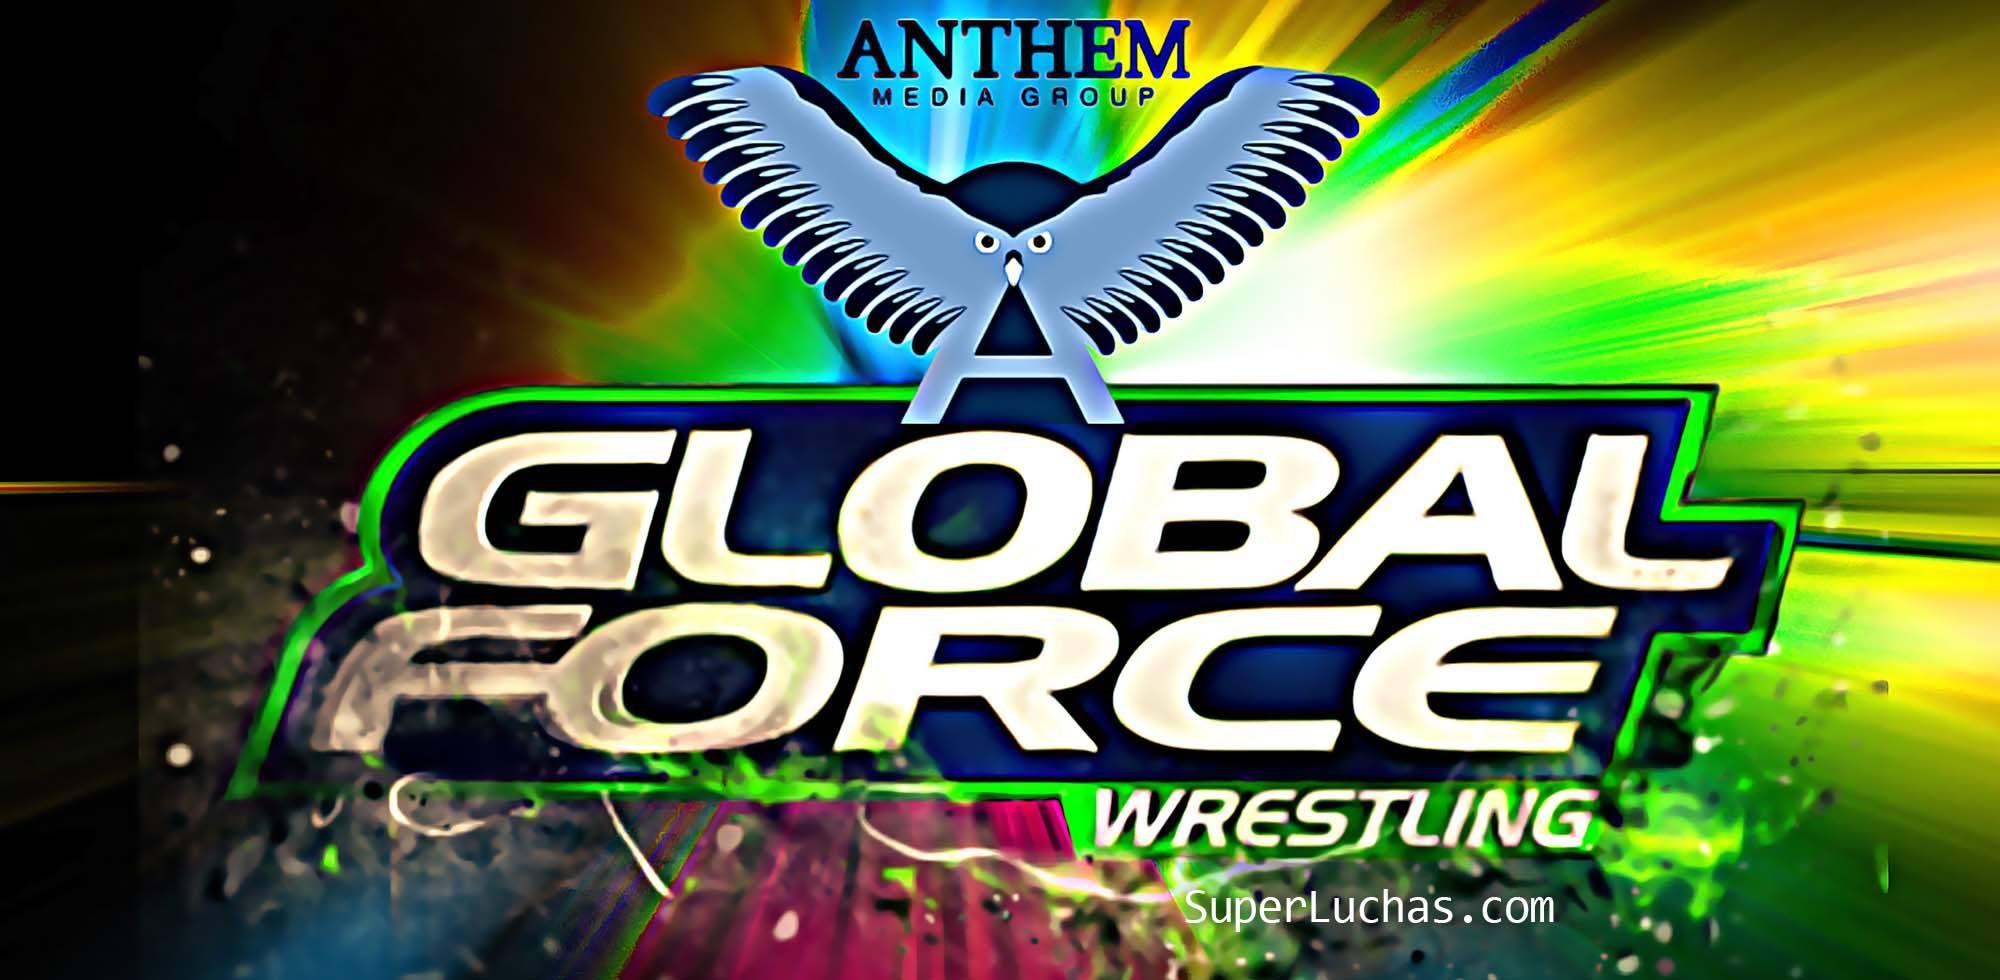 Anthem Media GFW, logos